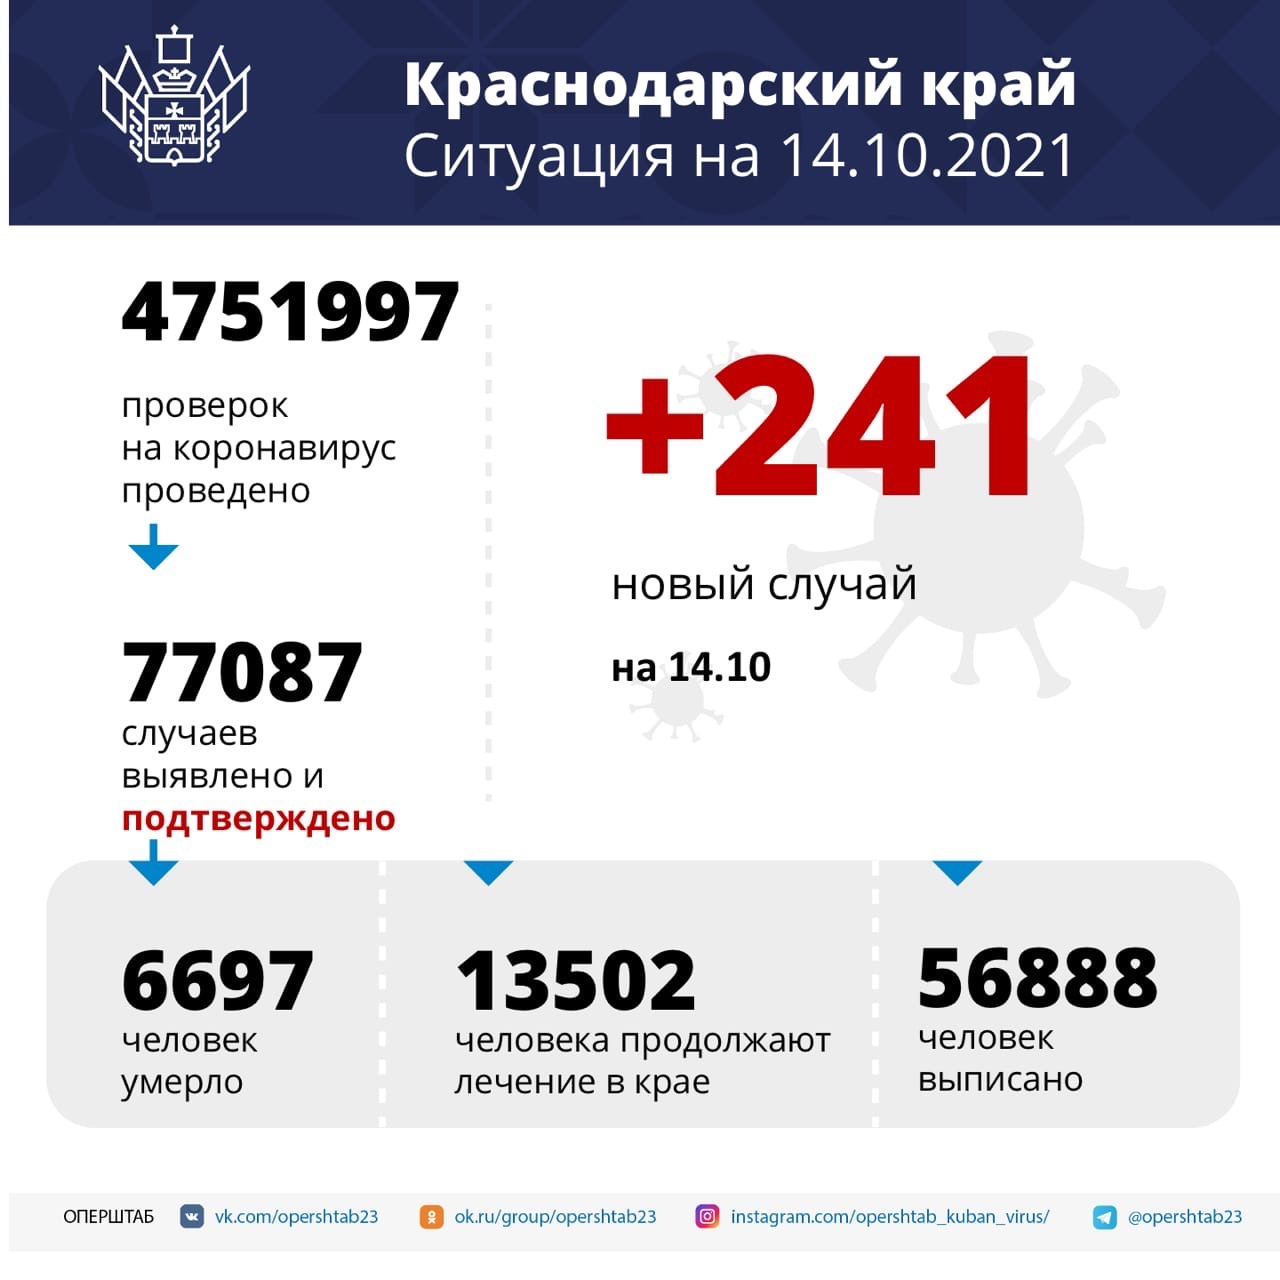 В Краснодарском крае на аппаратах ИВЛ находятся 109...